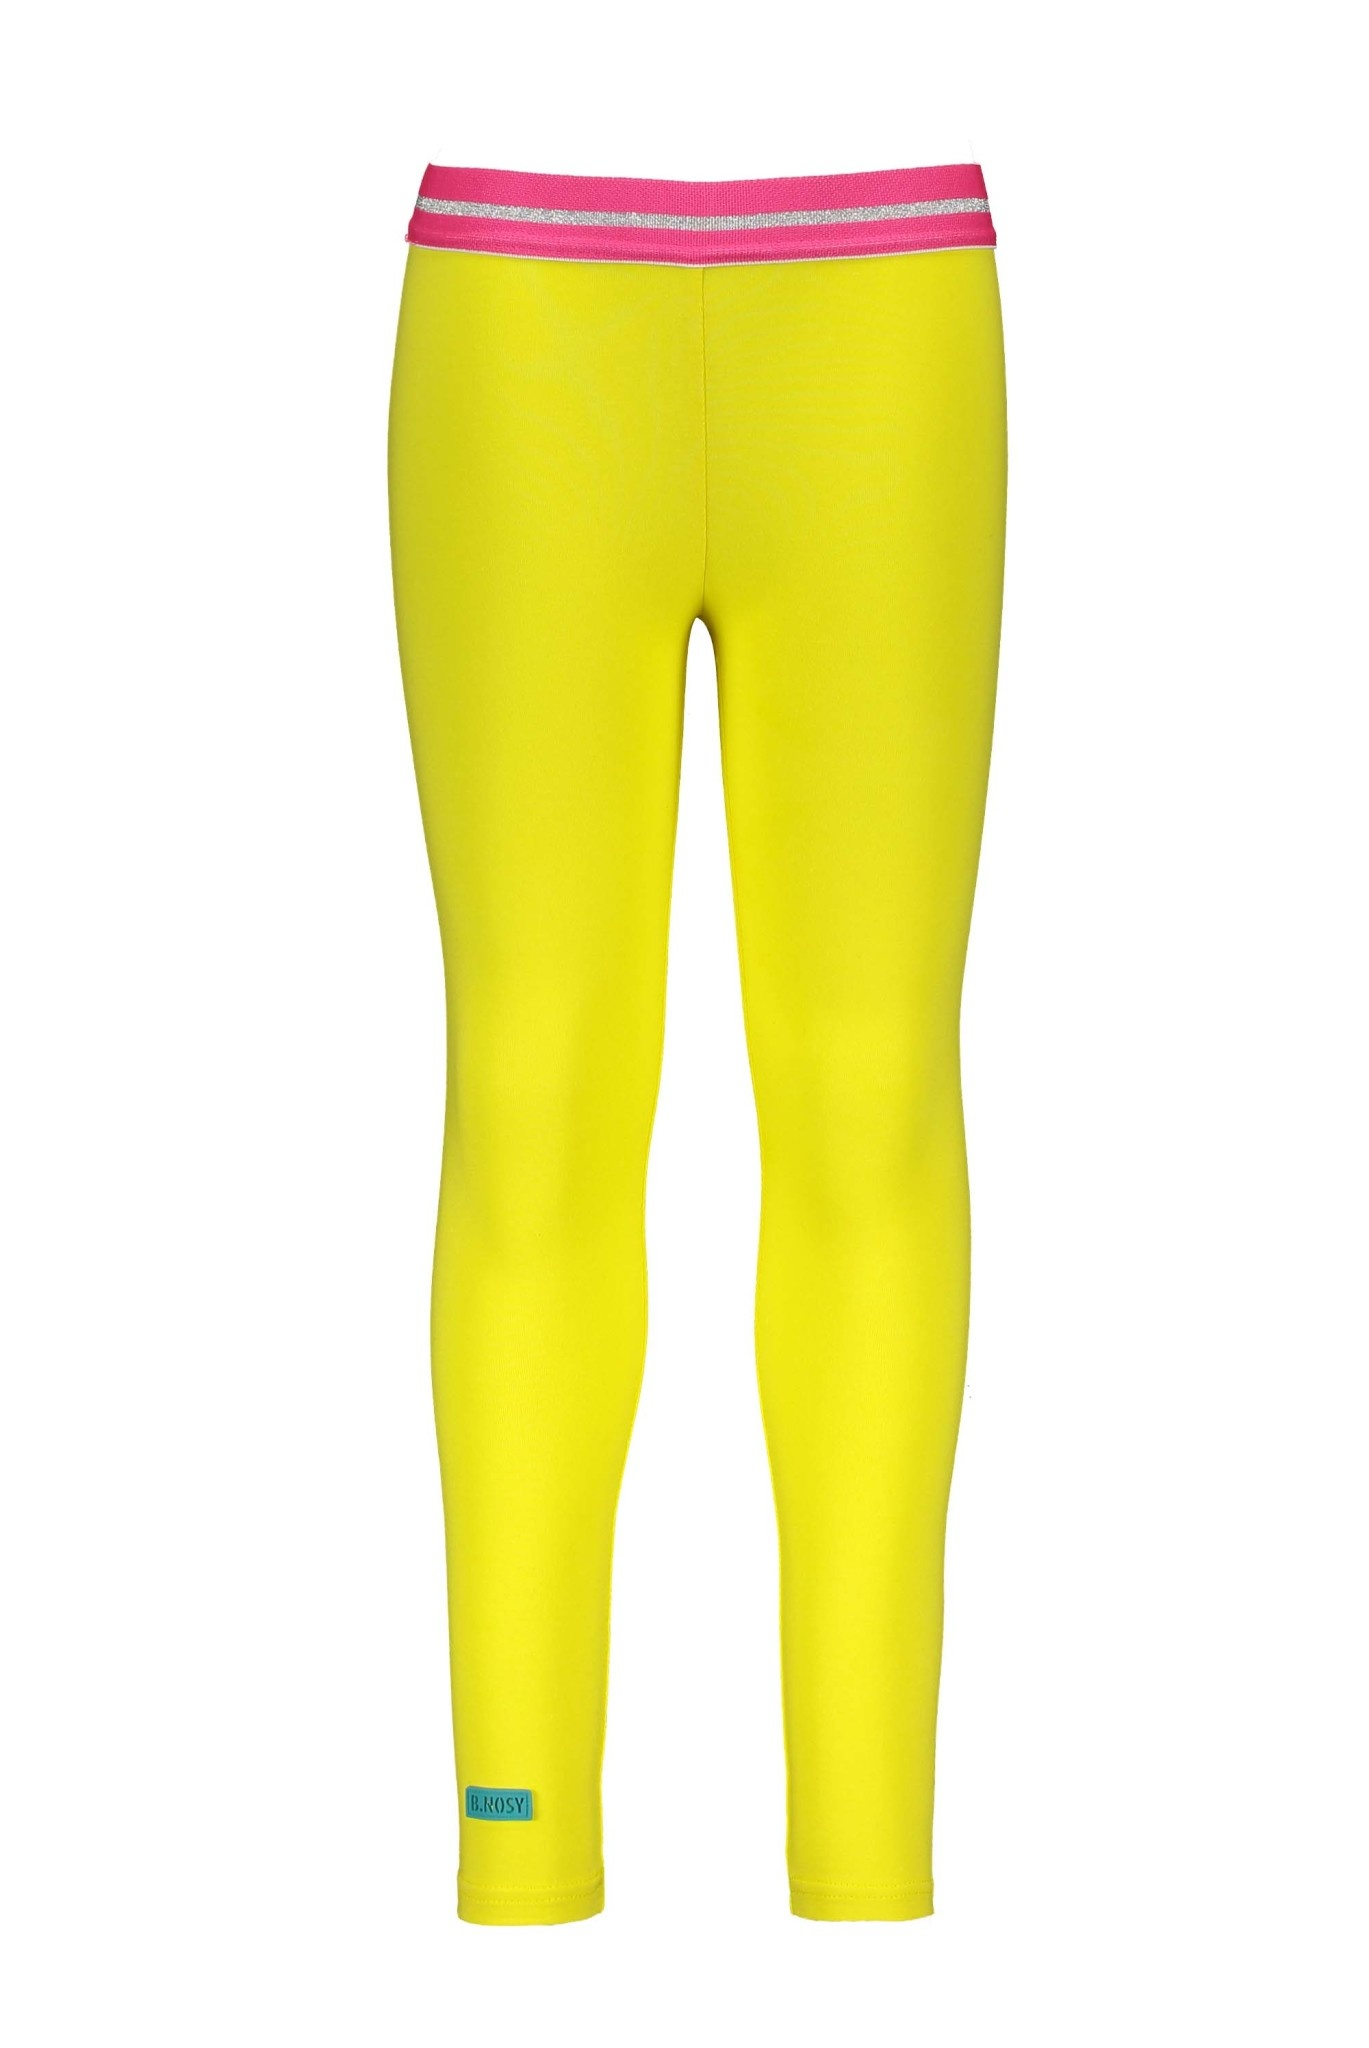 B.Nosy Meisjes Legging Y002-5530-1